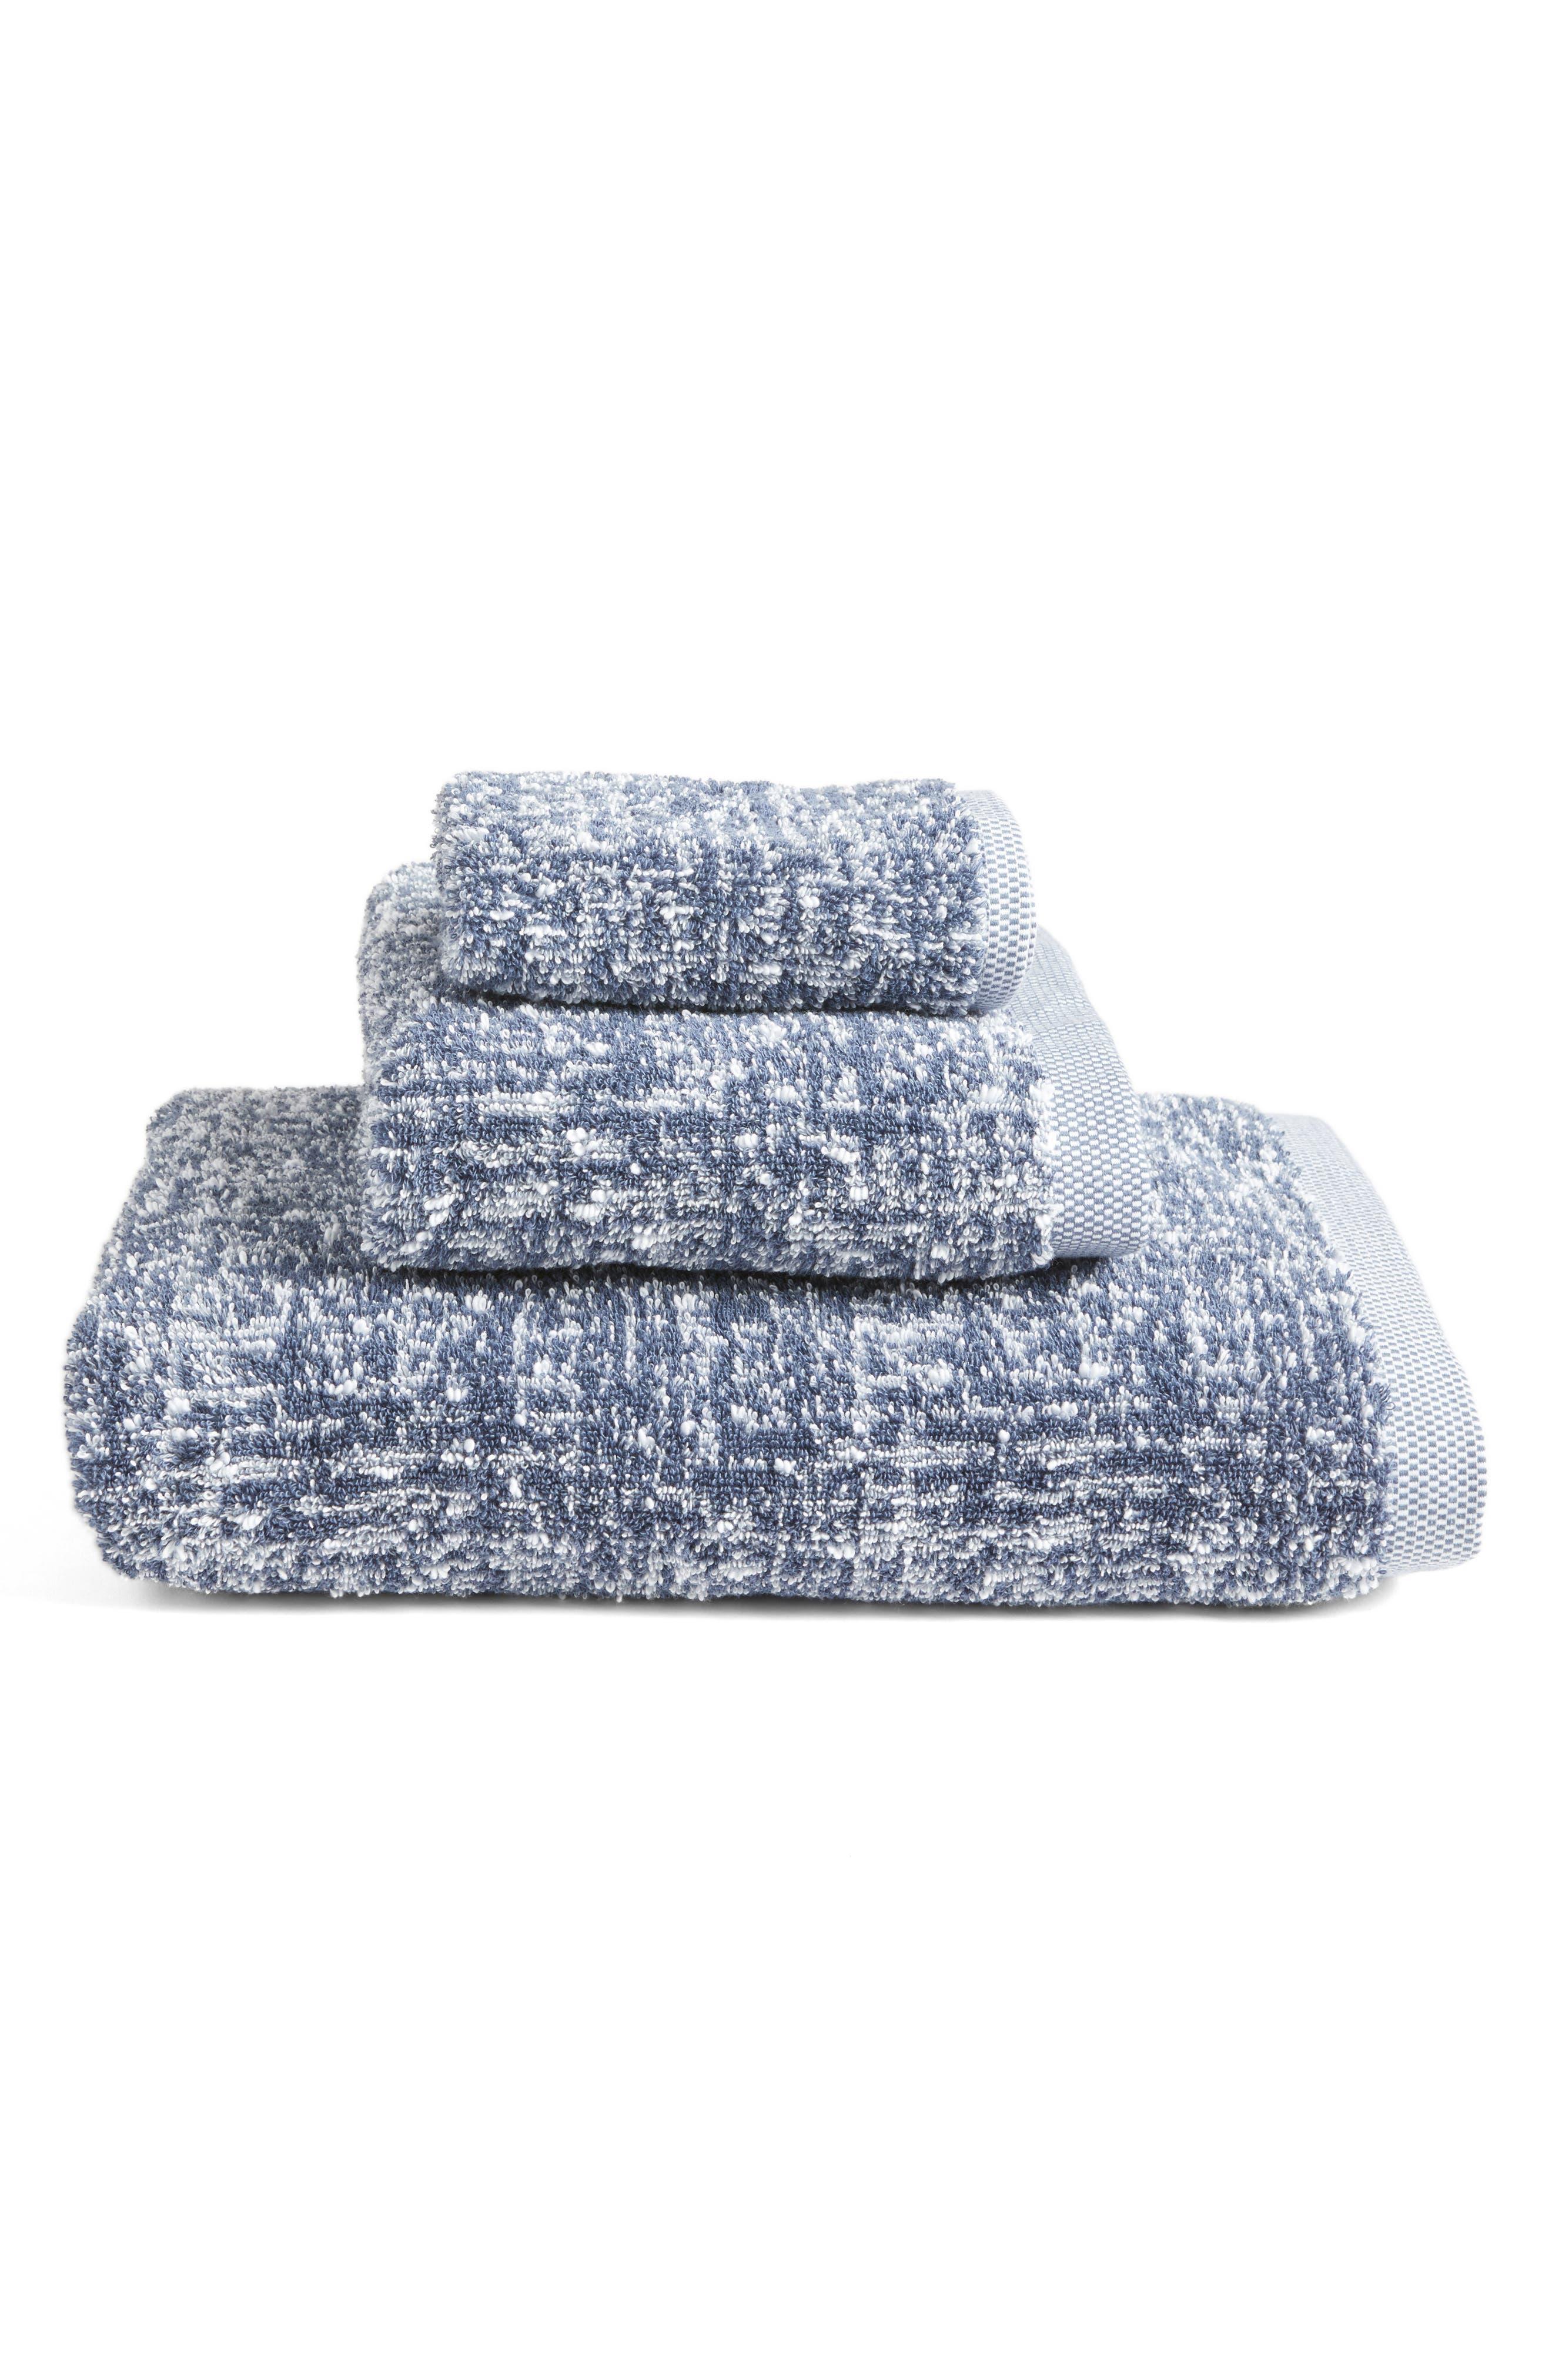 Alternate Image 3  - Nordstrom at Home Tweed Jacquard Hand Towel